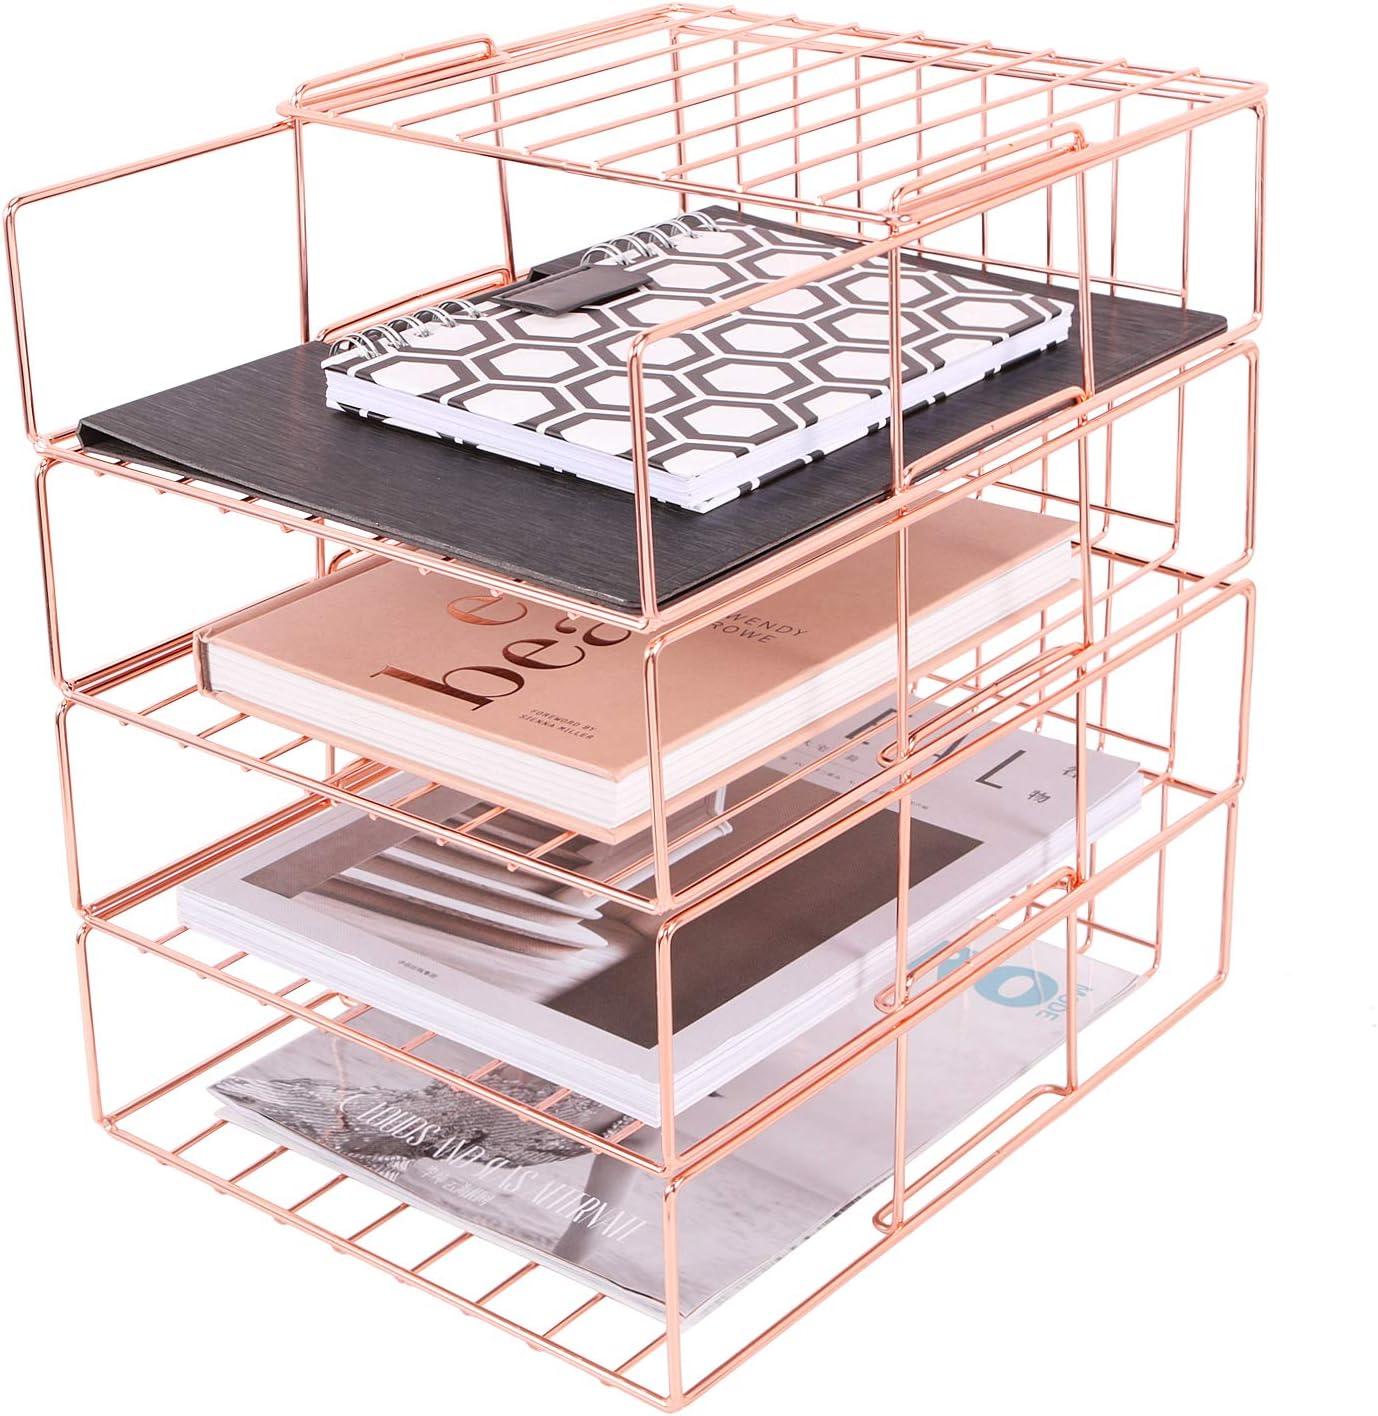 Hosaken Paper Tray 4 Tier Decorative File Large special price !! Stackable Desk Over item handling